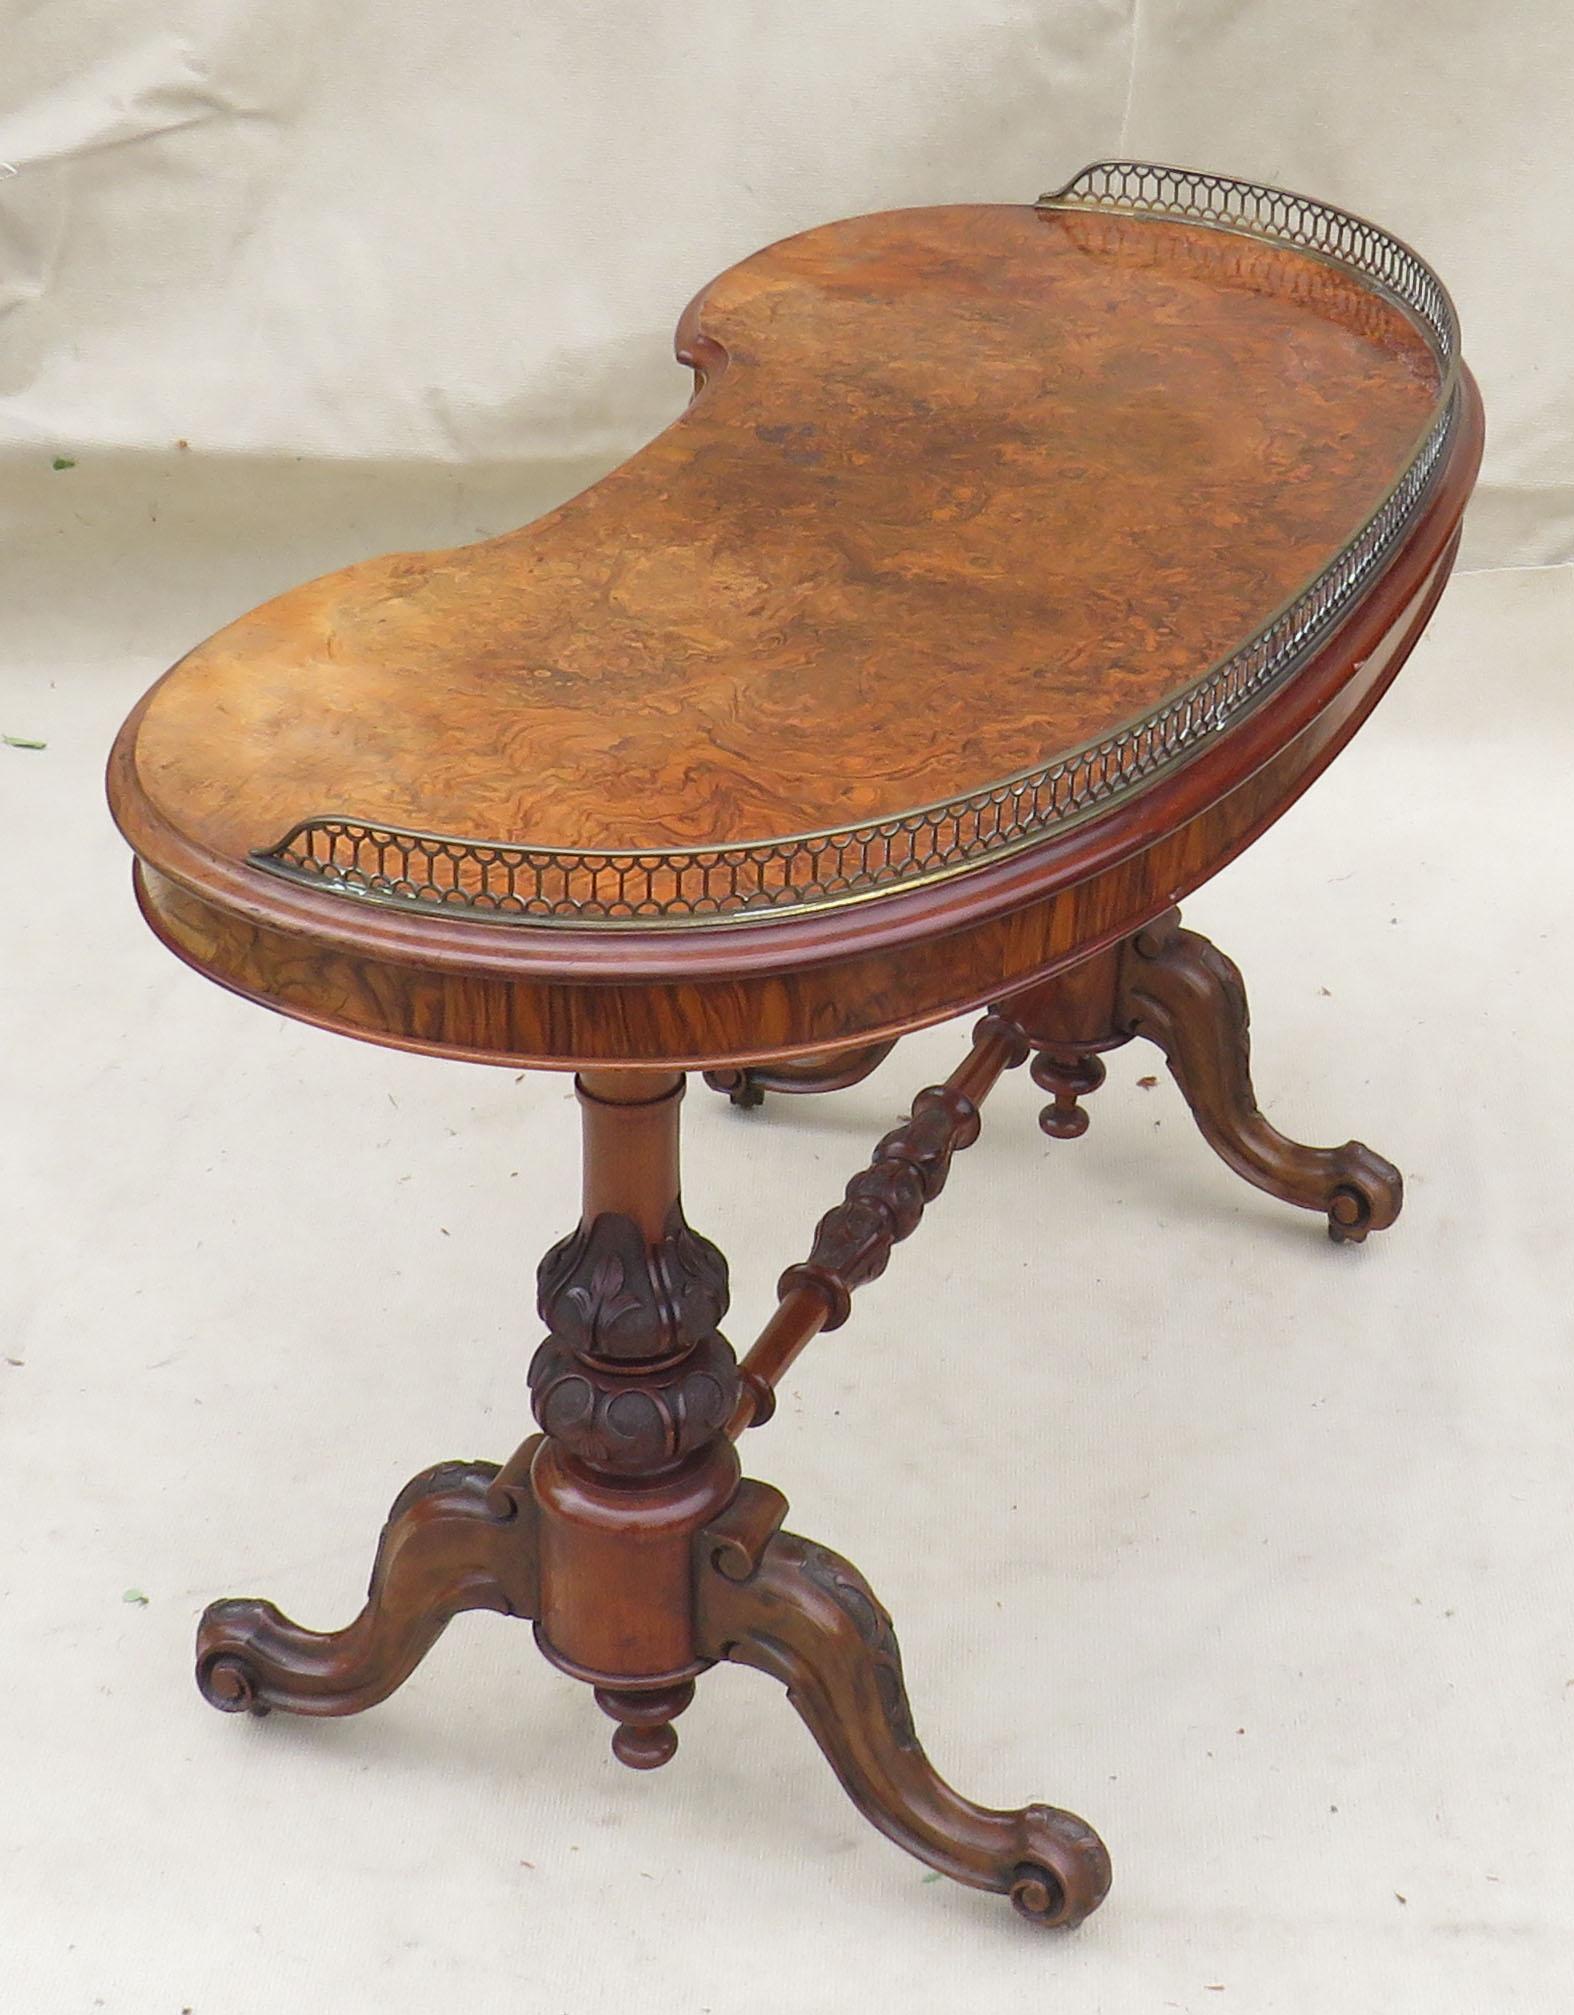 Walnut Kidney Shaped Writing Table, English Mid 19th Century - Image 6 of 8